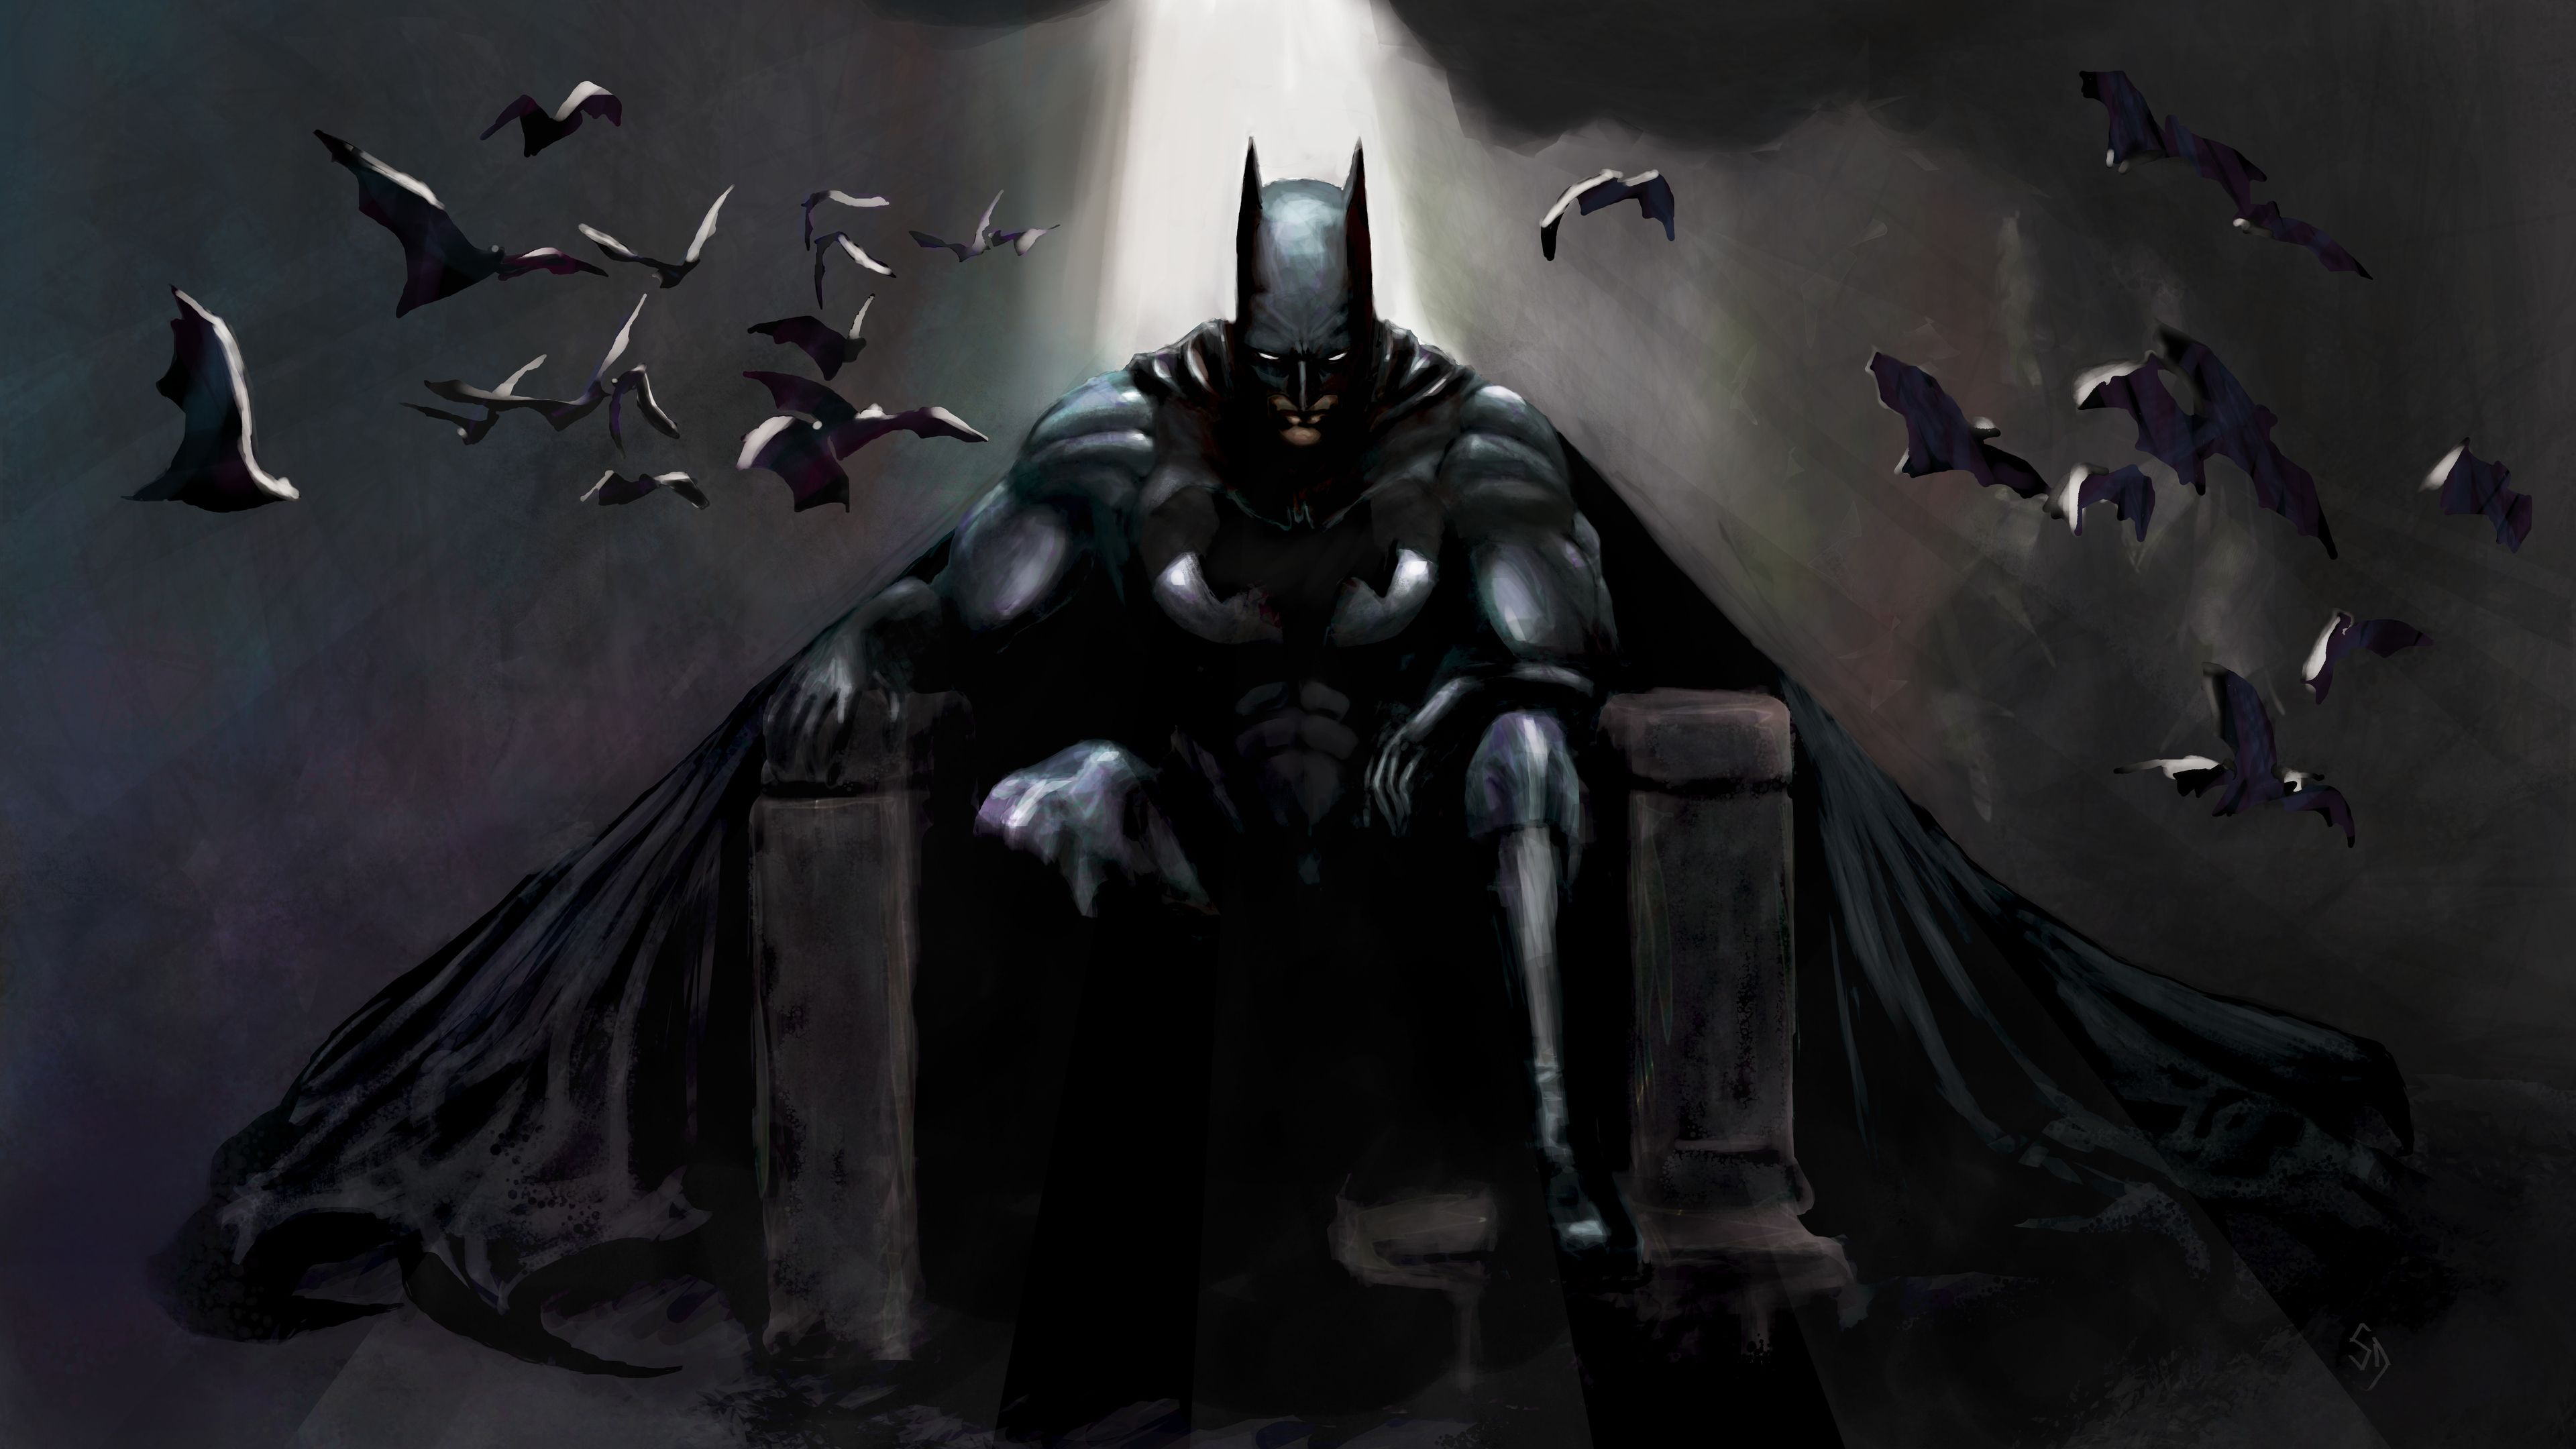 Batman Gothic Contemplation 4k Superheroes Wallpapers Hd Wallpapers Digital Art Wallpapers Deviantart Wallpapers Batma Batman Wallpaper 8k Wallpaper Batman